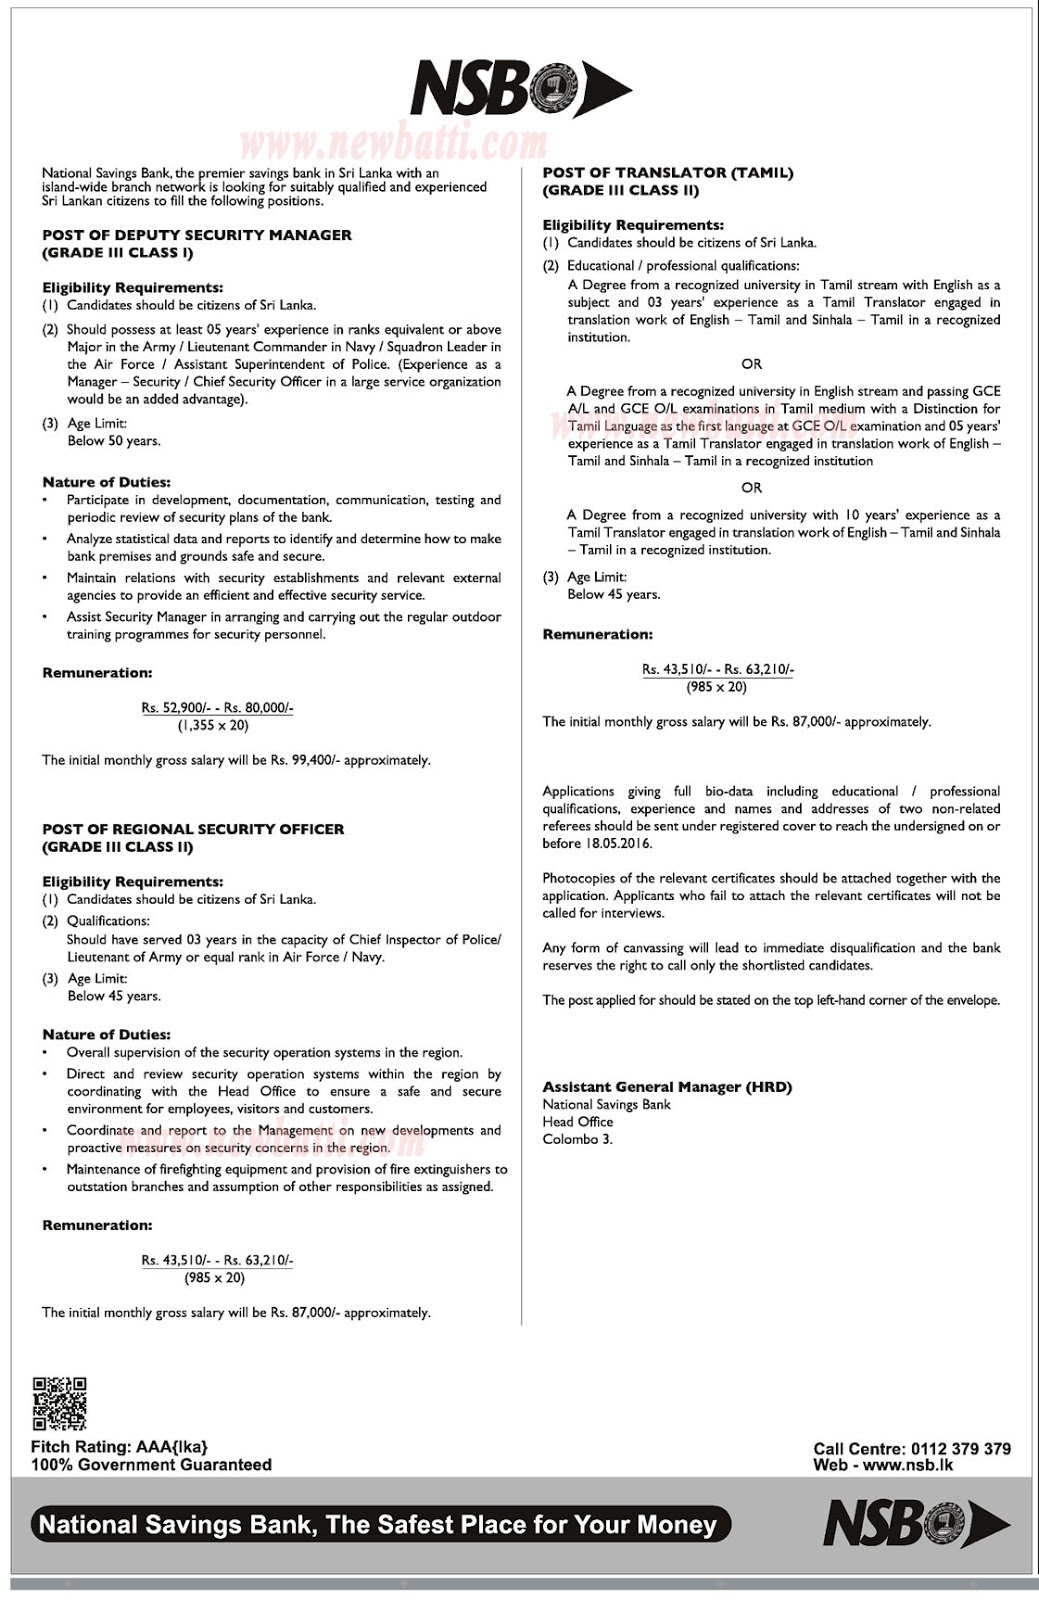 Deputy Security Manager Regional Officer Translator Data Tamil National Savings Bank Nsb 2016 May 18